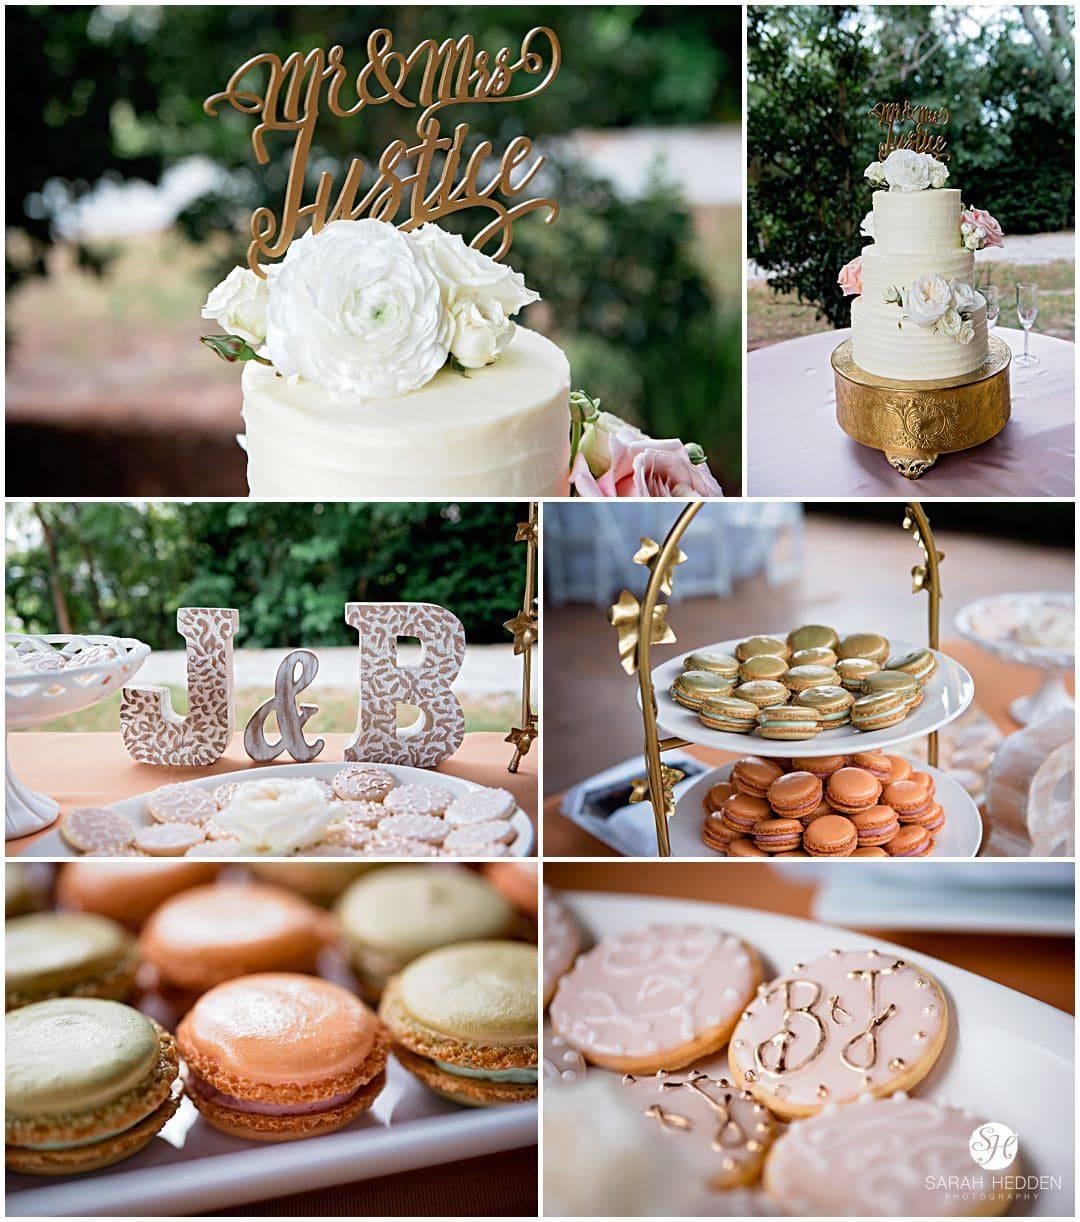 Wedding detail shots of cake and food at Bridgette and Jonathon's Wedding in Charleston